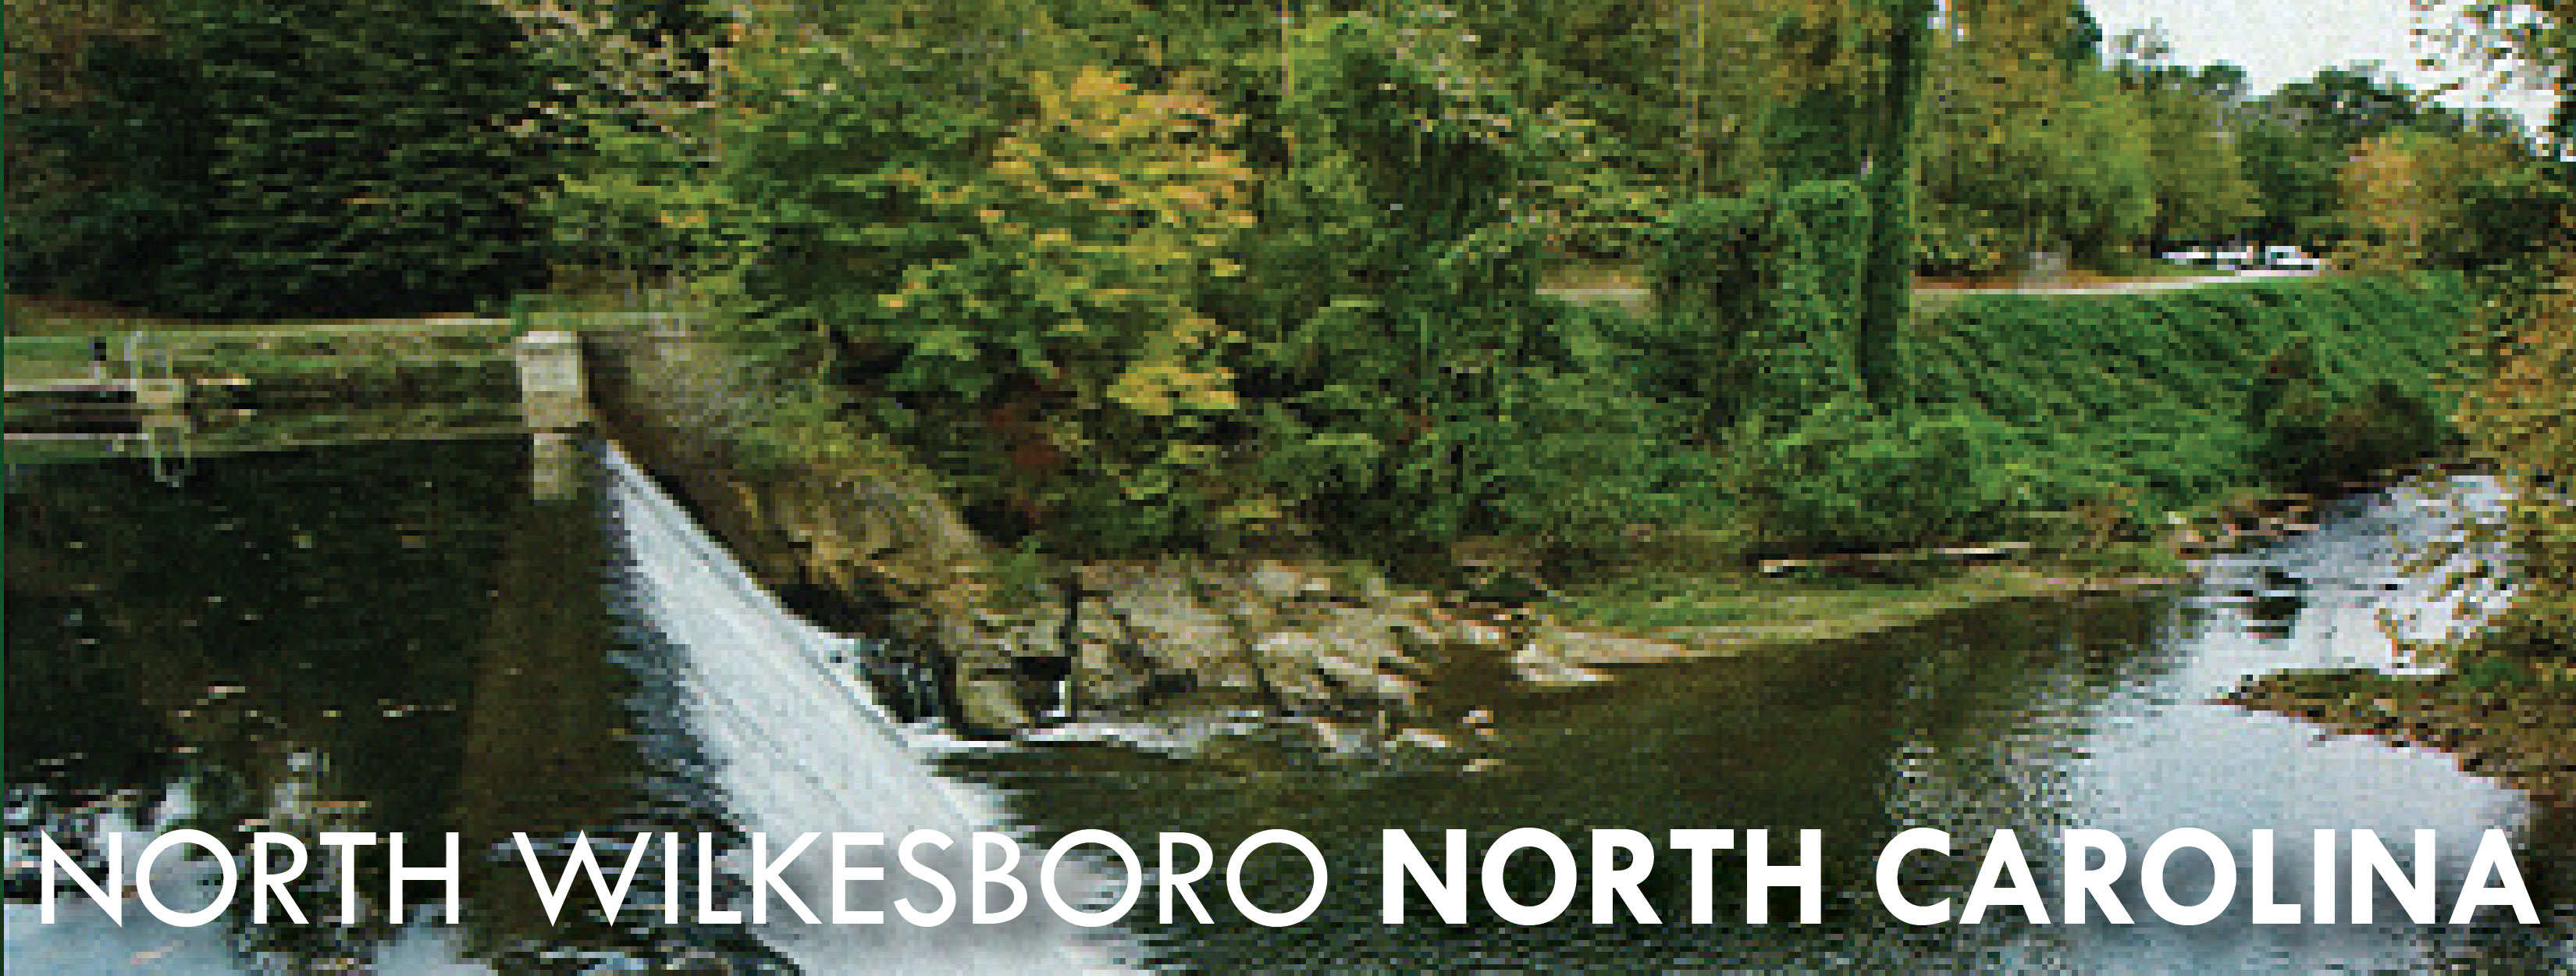 North Wilkesboro